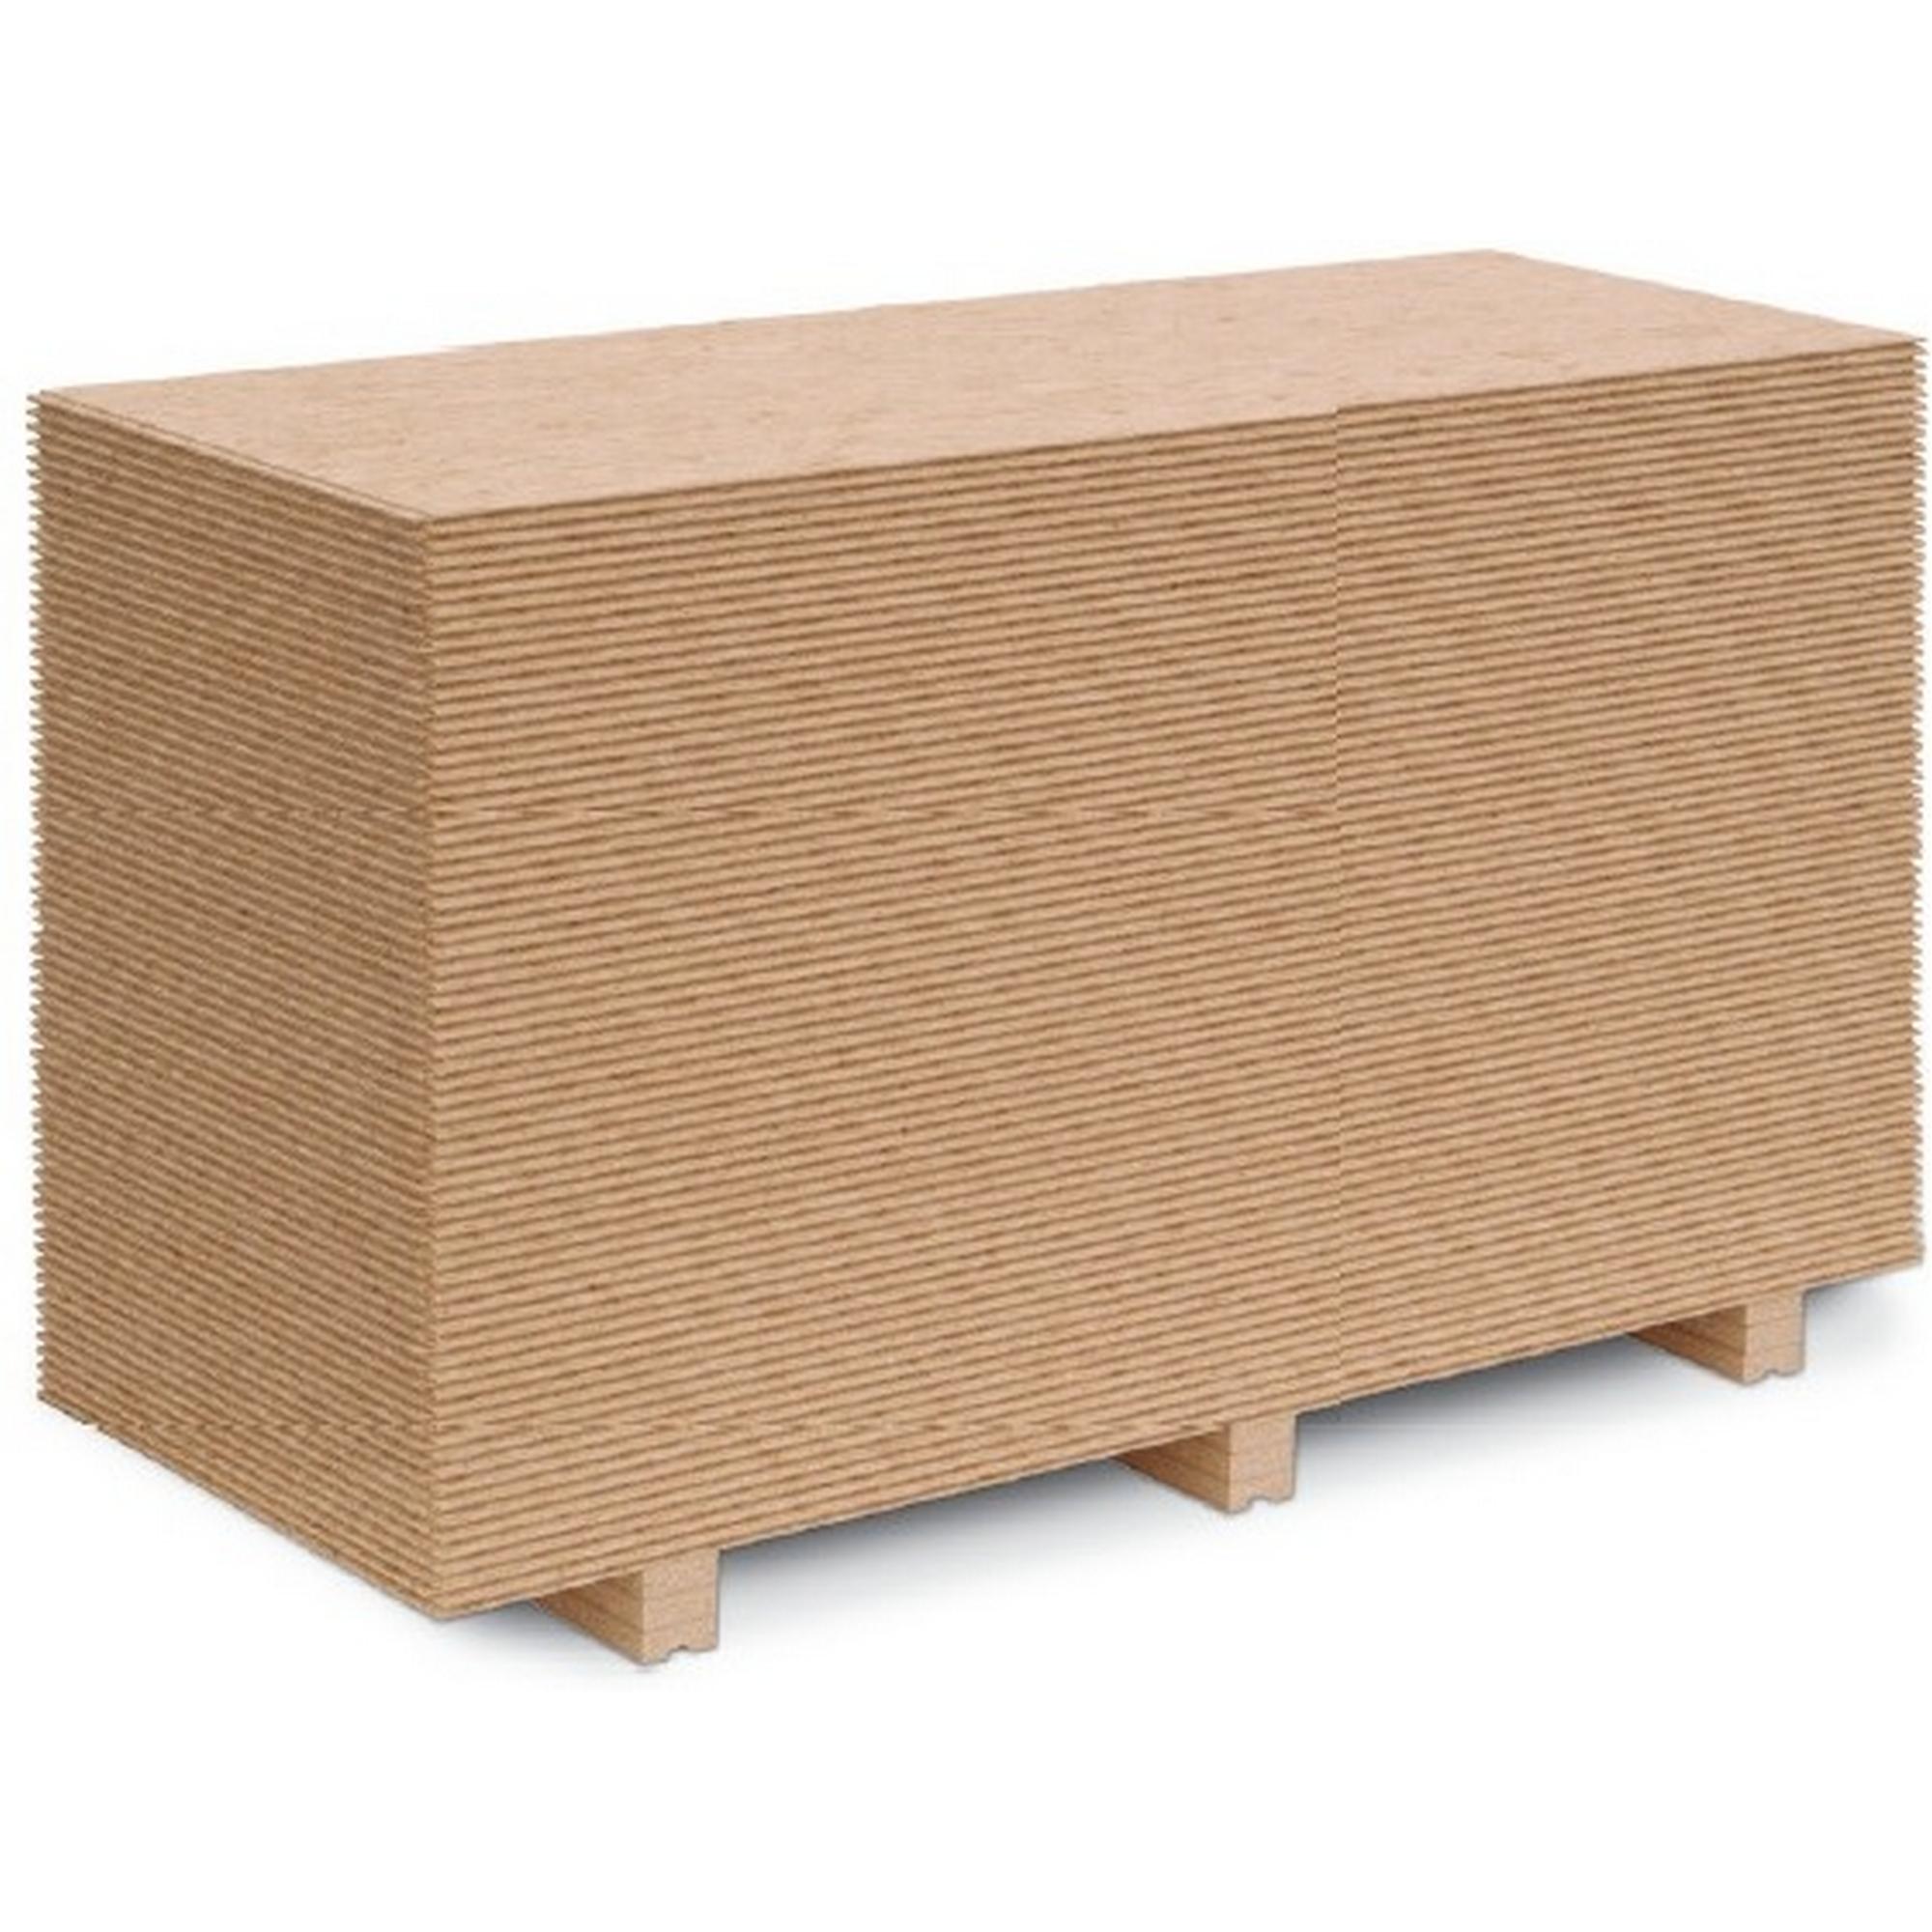 Verlegeplatten ǀ Toom Baumarkt